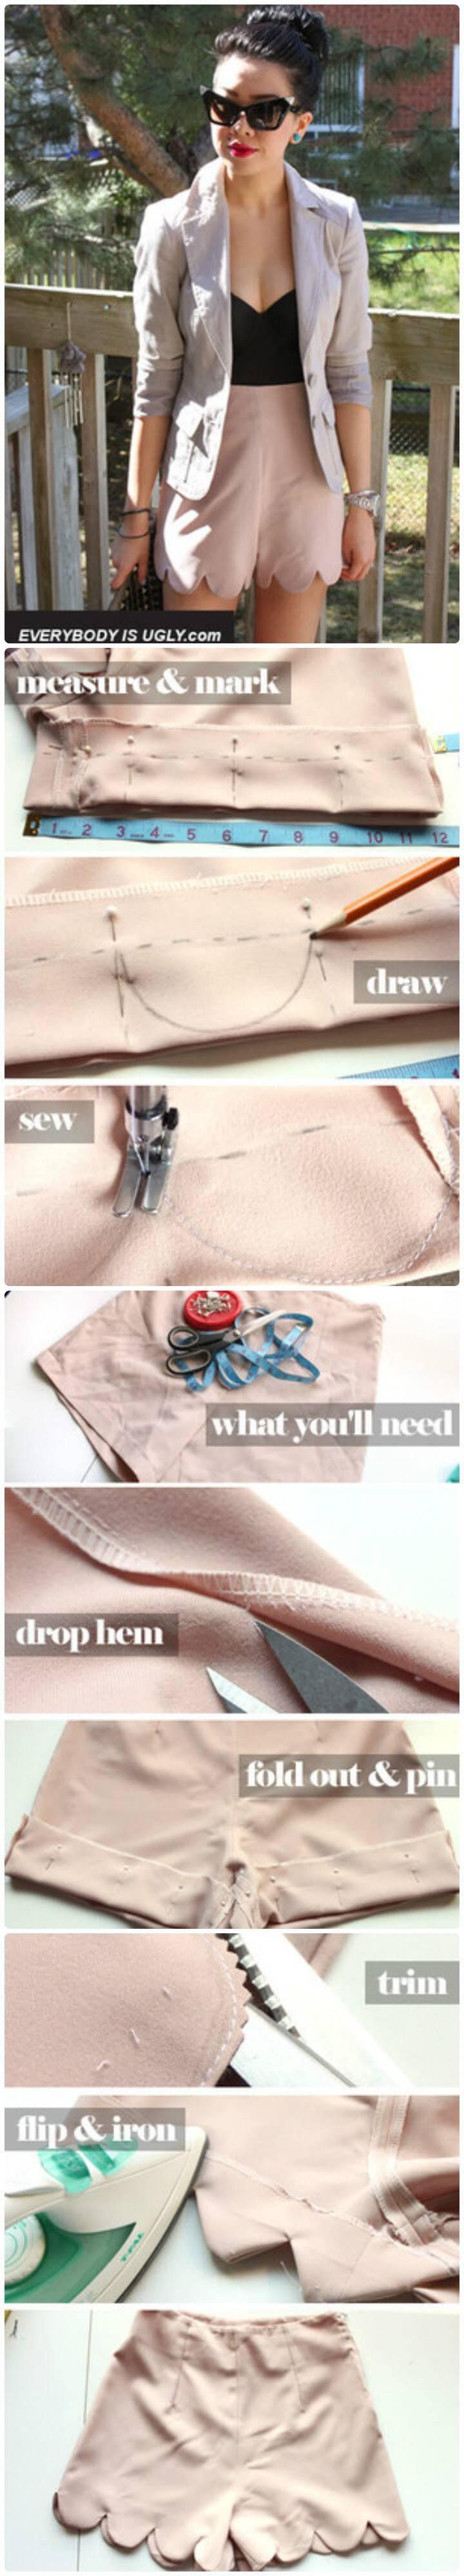 DIY peach scalloped shorts